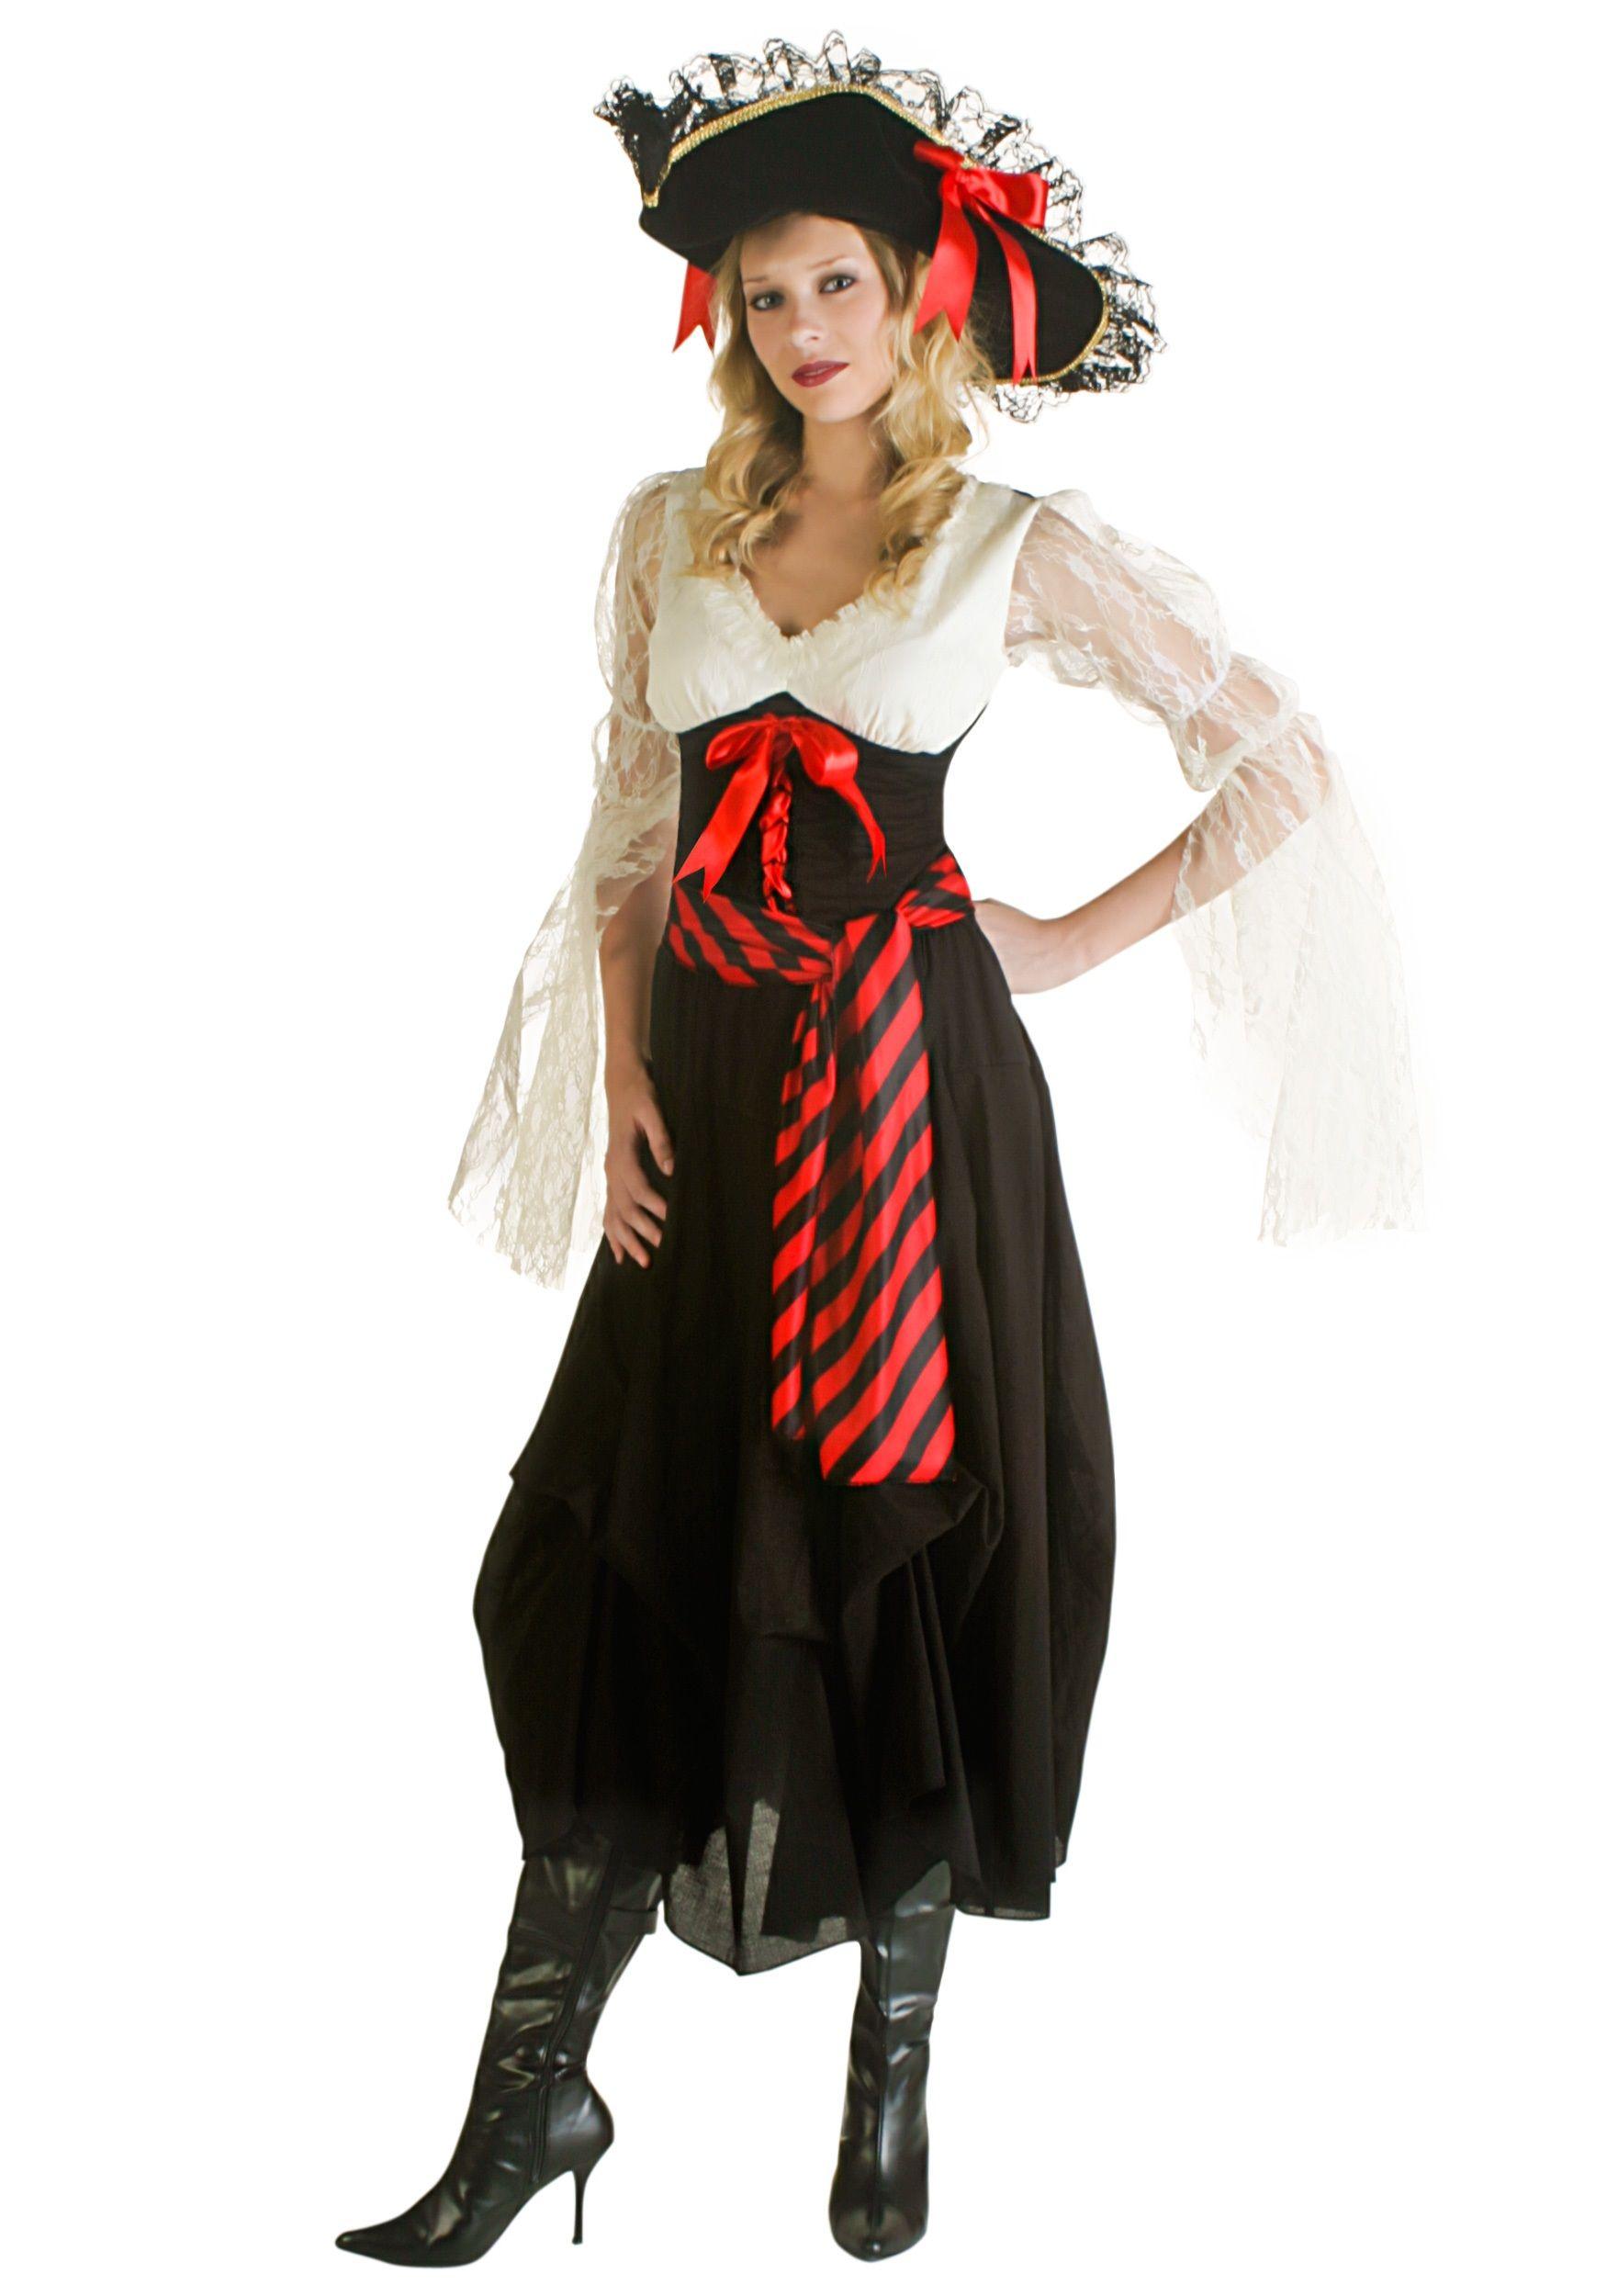 group pirate costume ideas diy | Halloween Costume Ideas Pirate ...